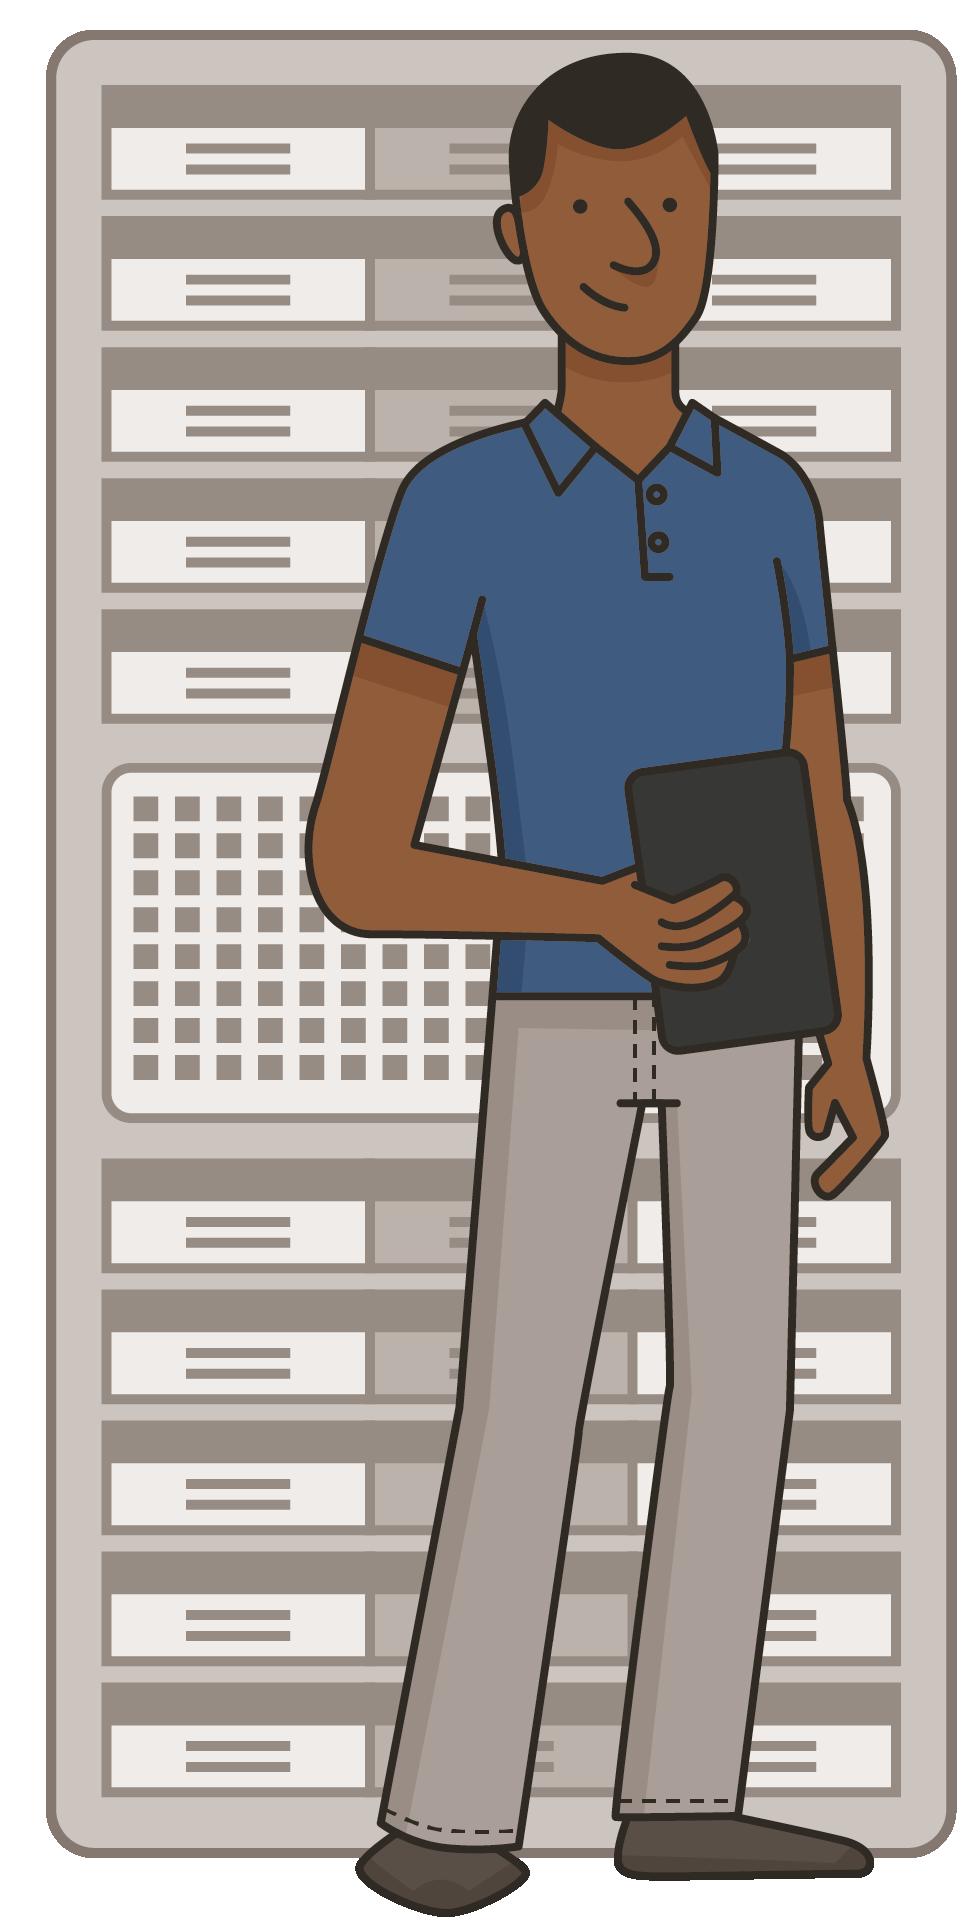 datatekniker.png